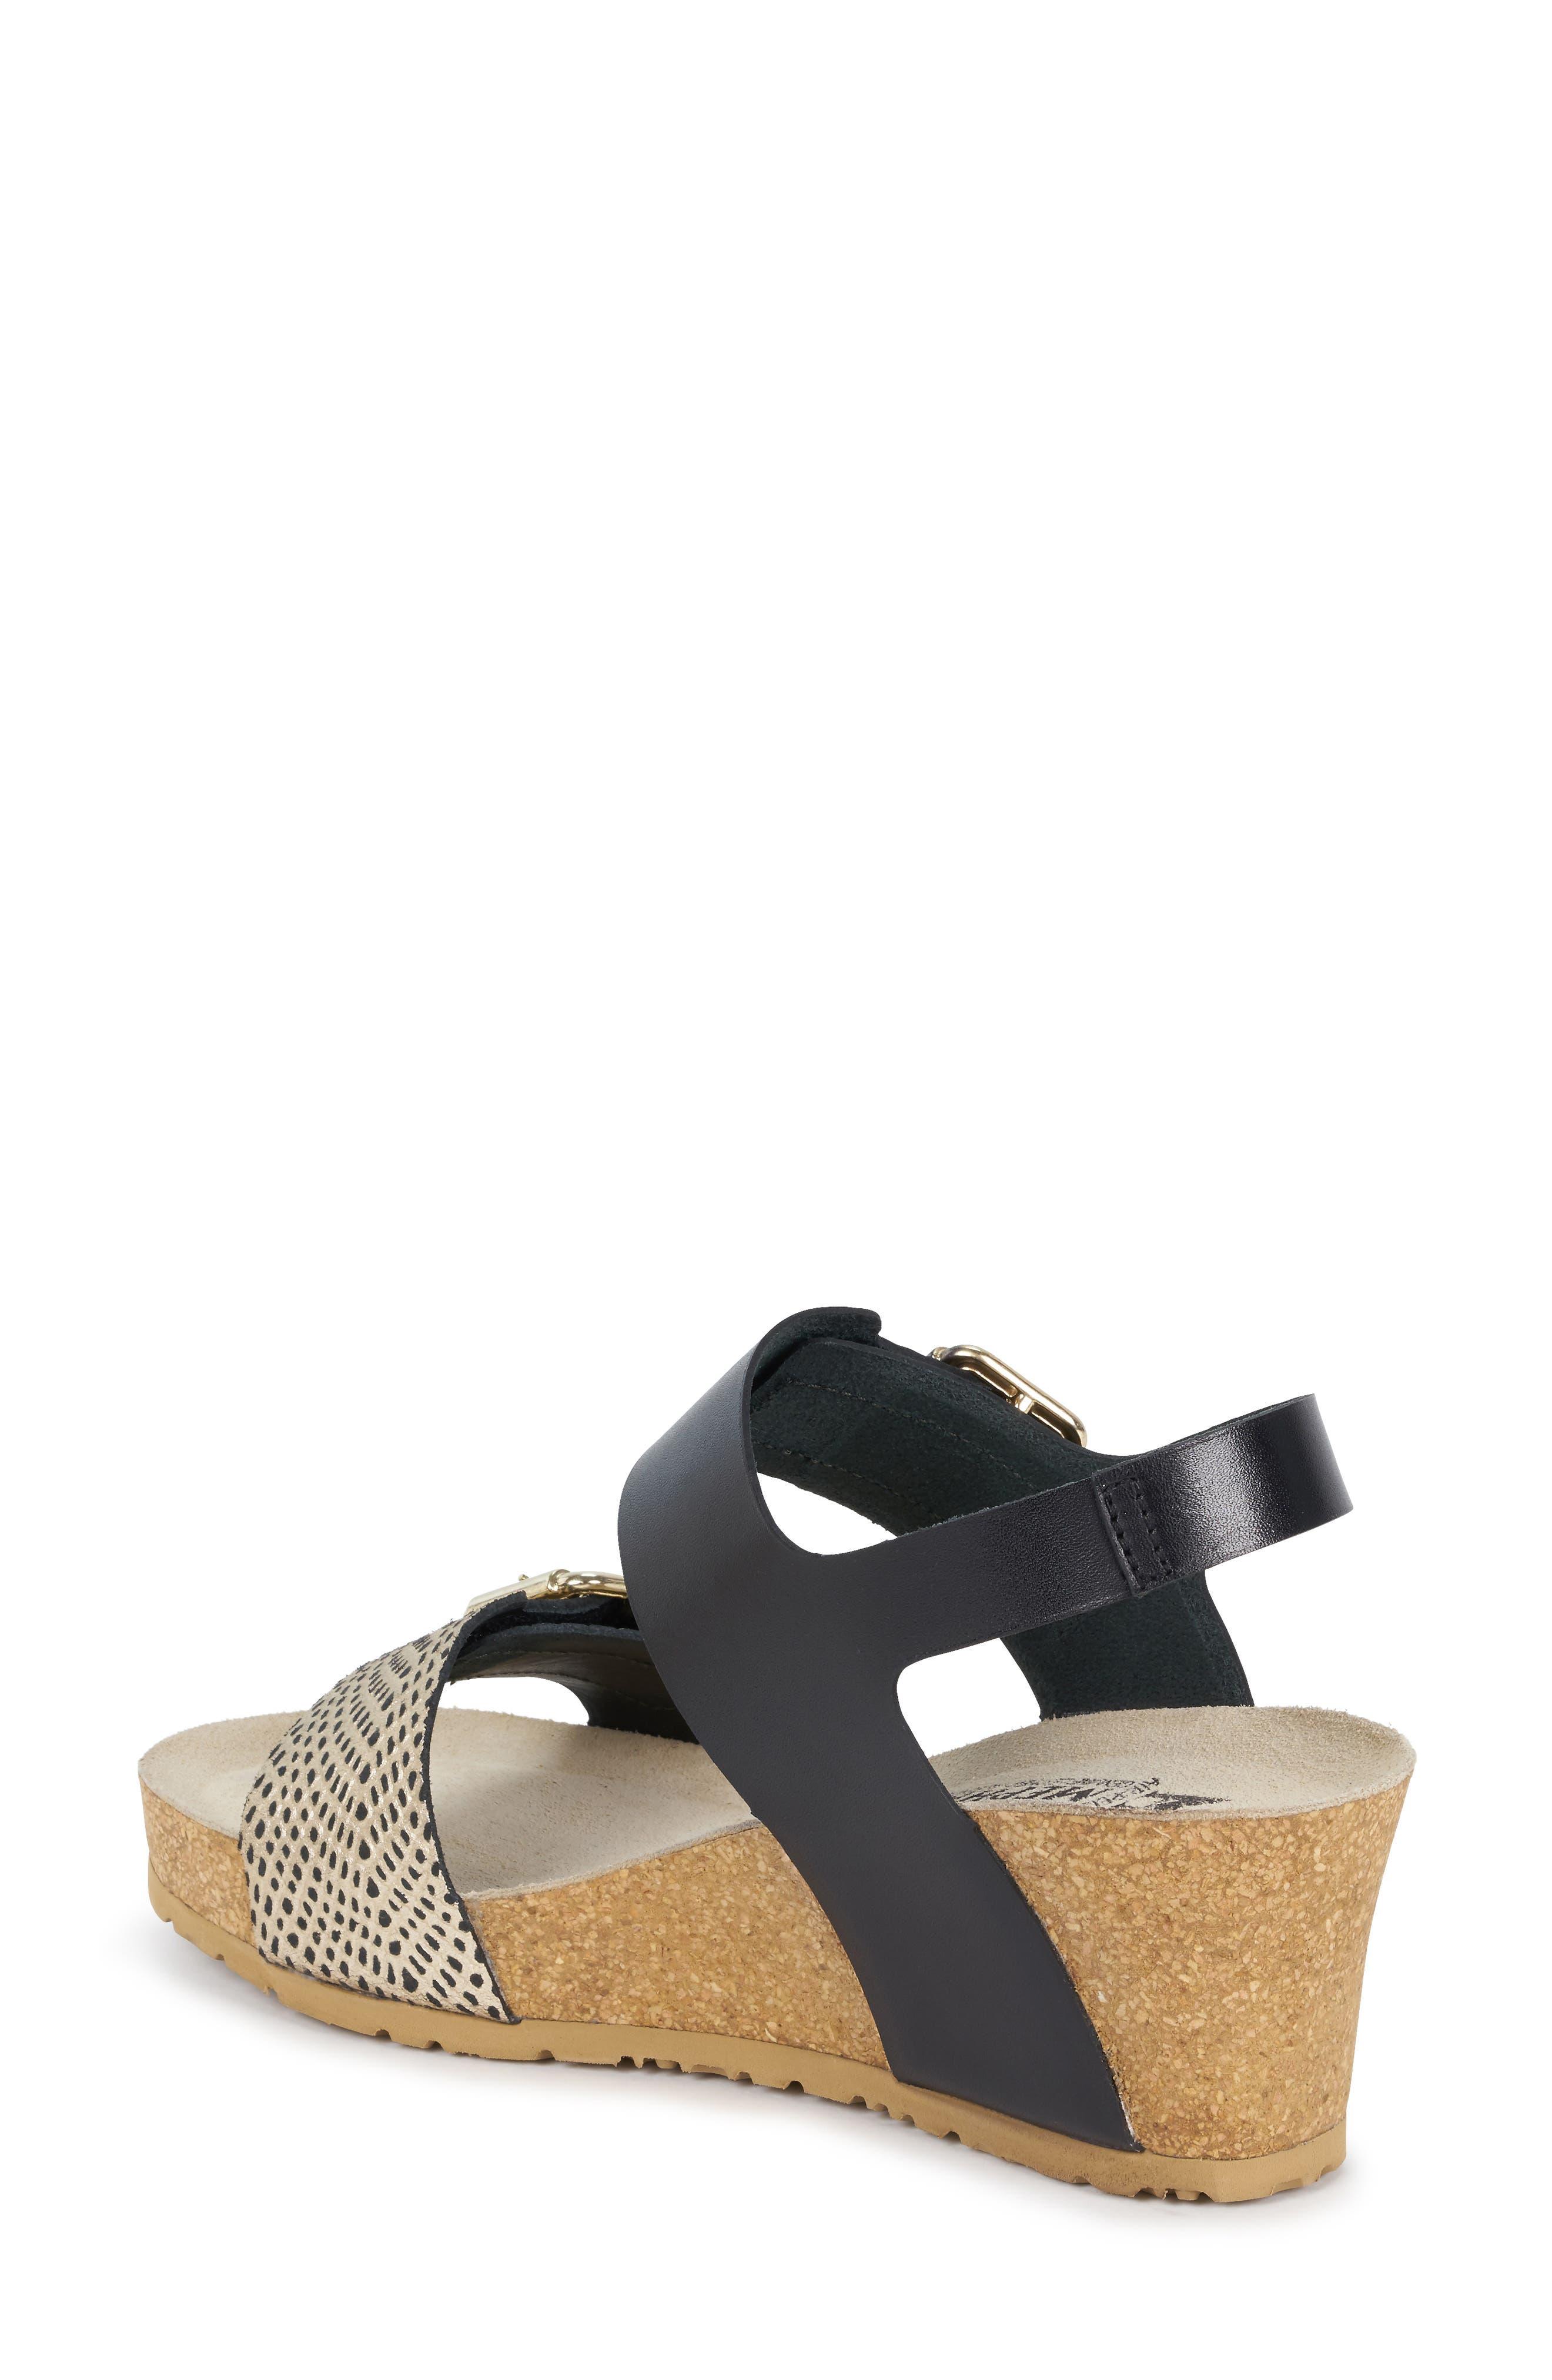 Lissandra Platform Wedge Sandal,                             Alternate thumbnail 2, color,                             BLACK/ GOLD LEATHER